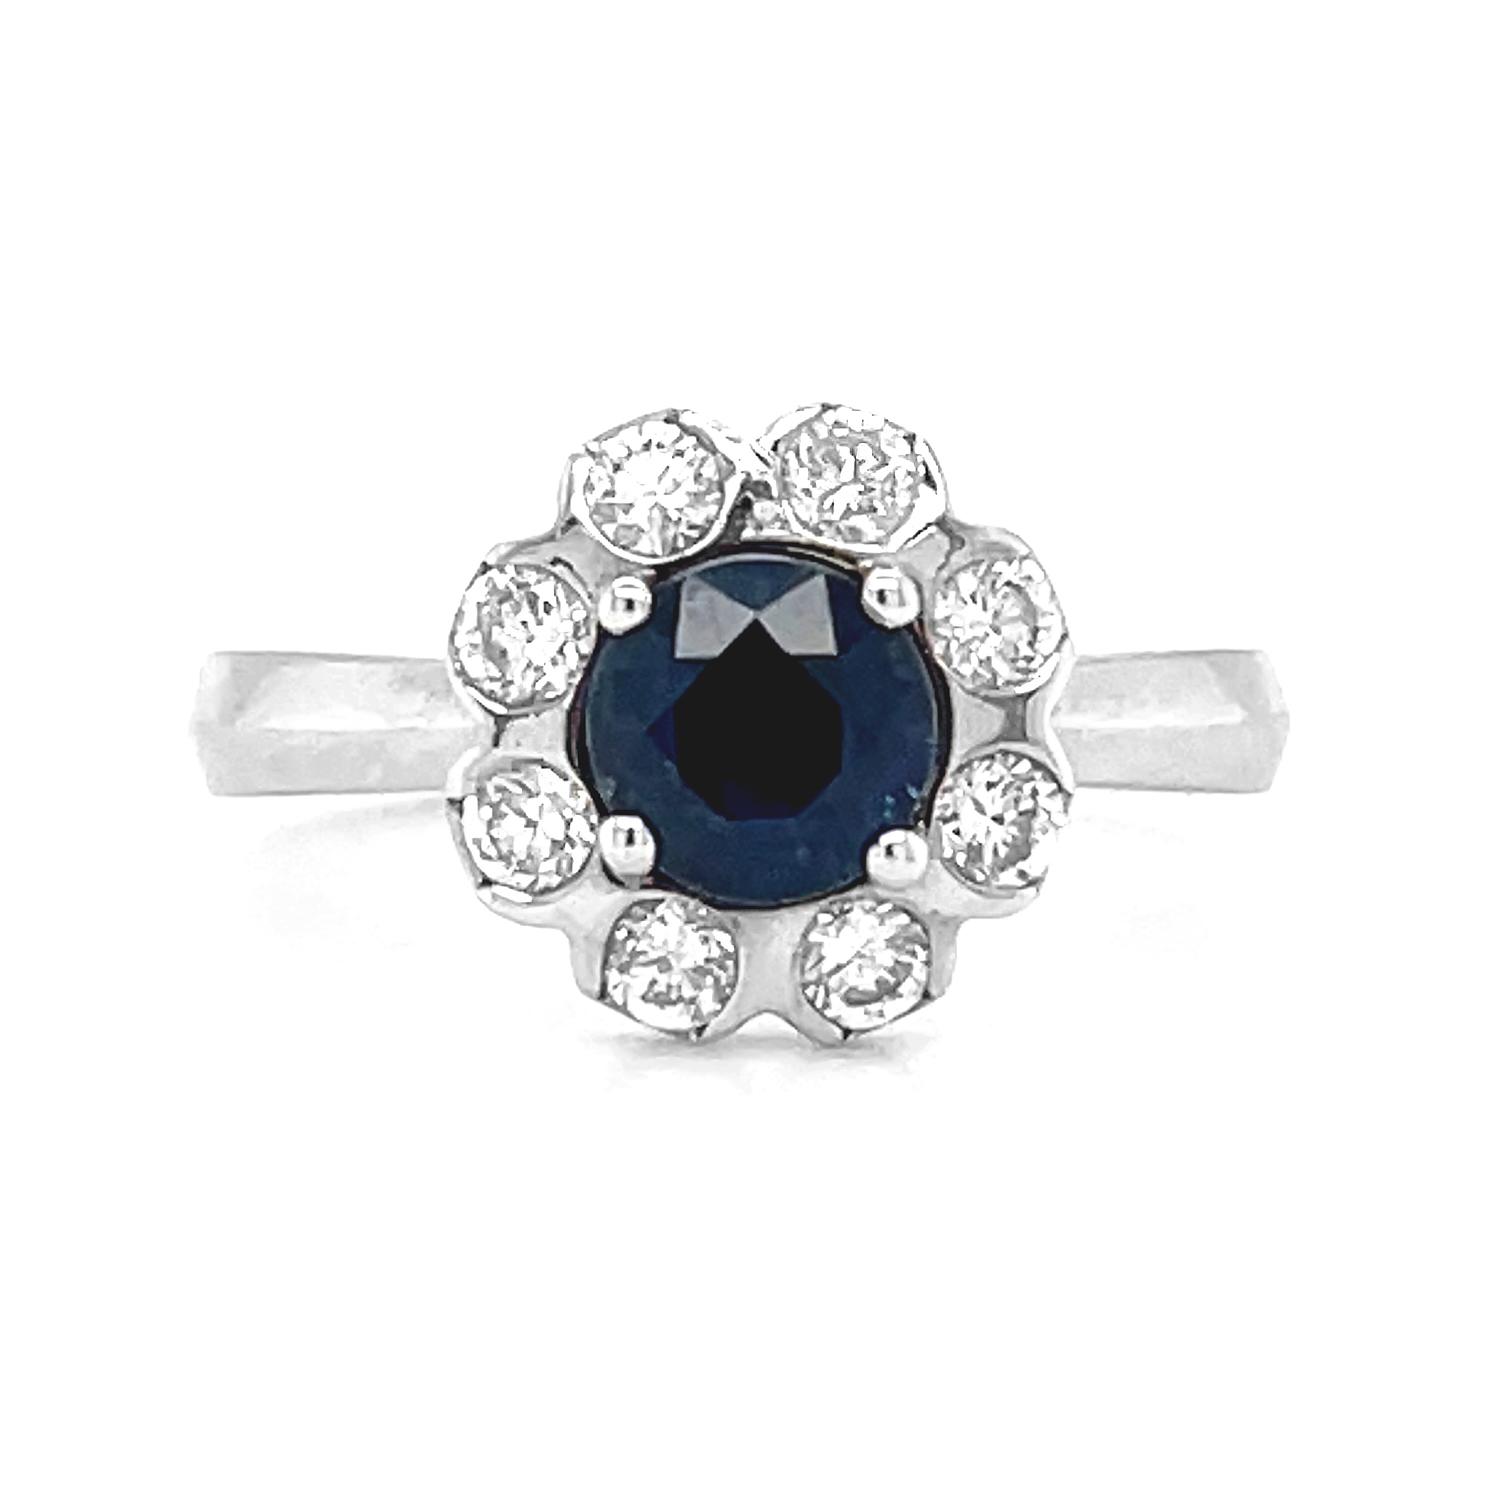 18k White Gold Round Sapphire & Diamond Ring